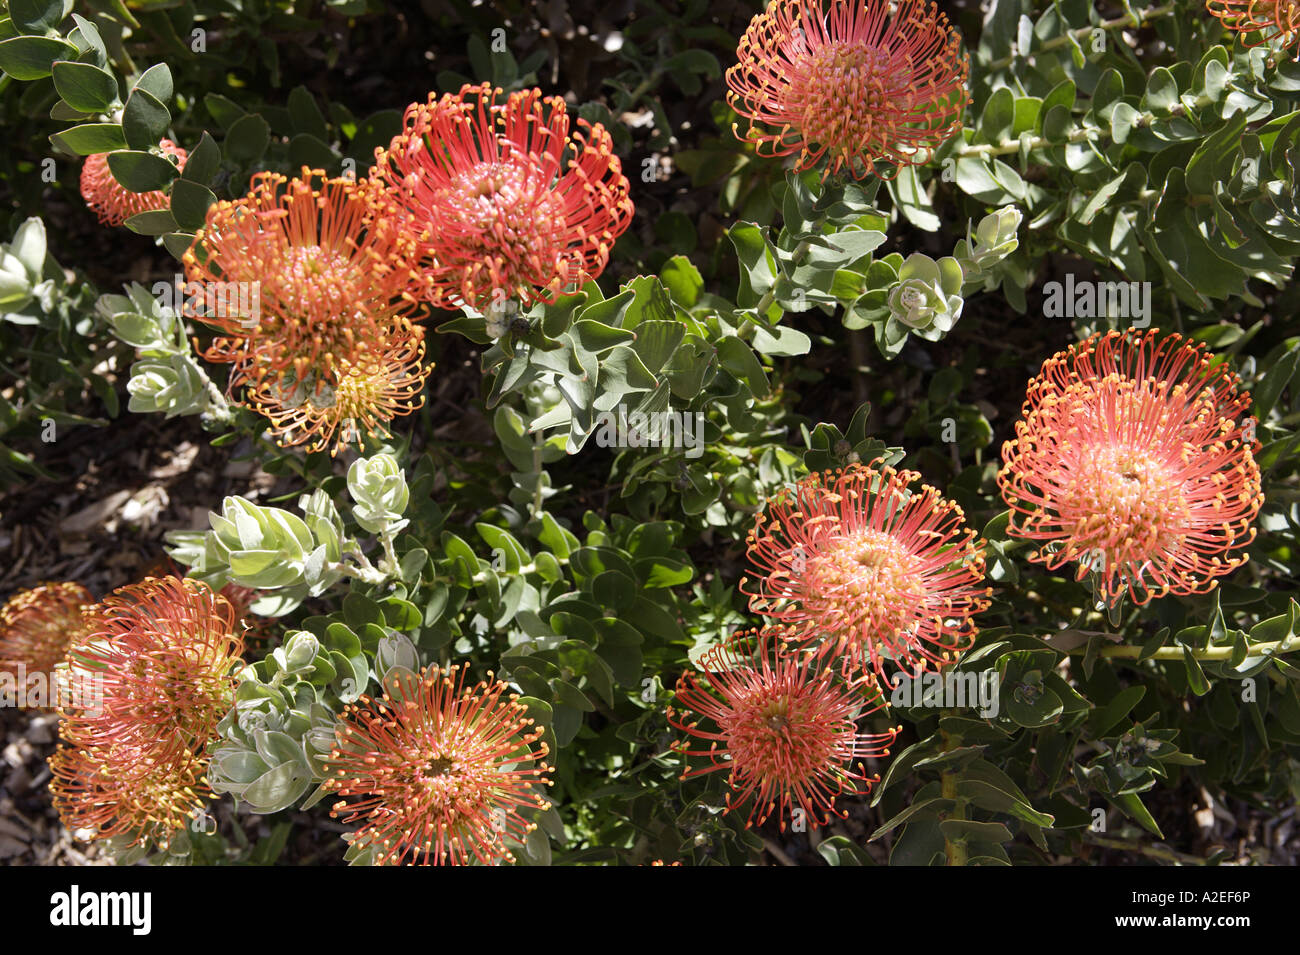 Protea Flowers, Kirstenbosch Botanical Gardens, Cape Town, South Africa